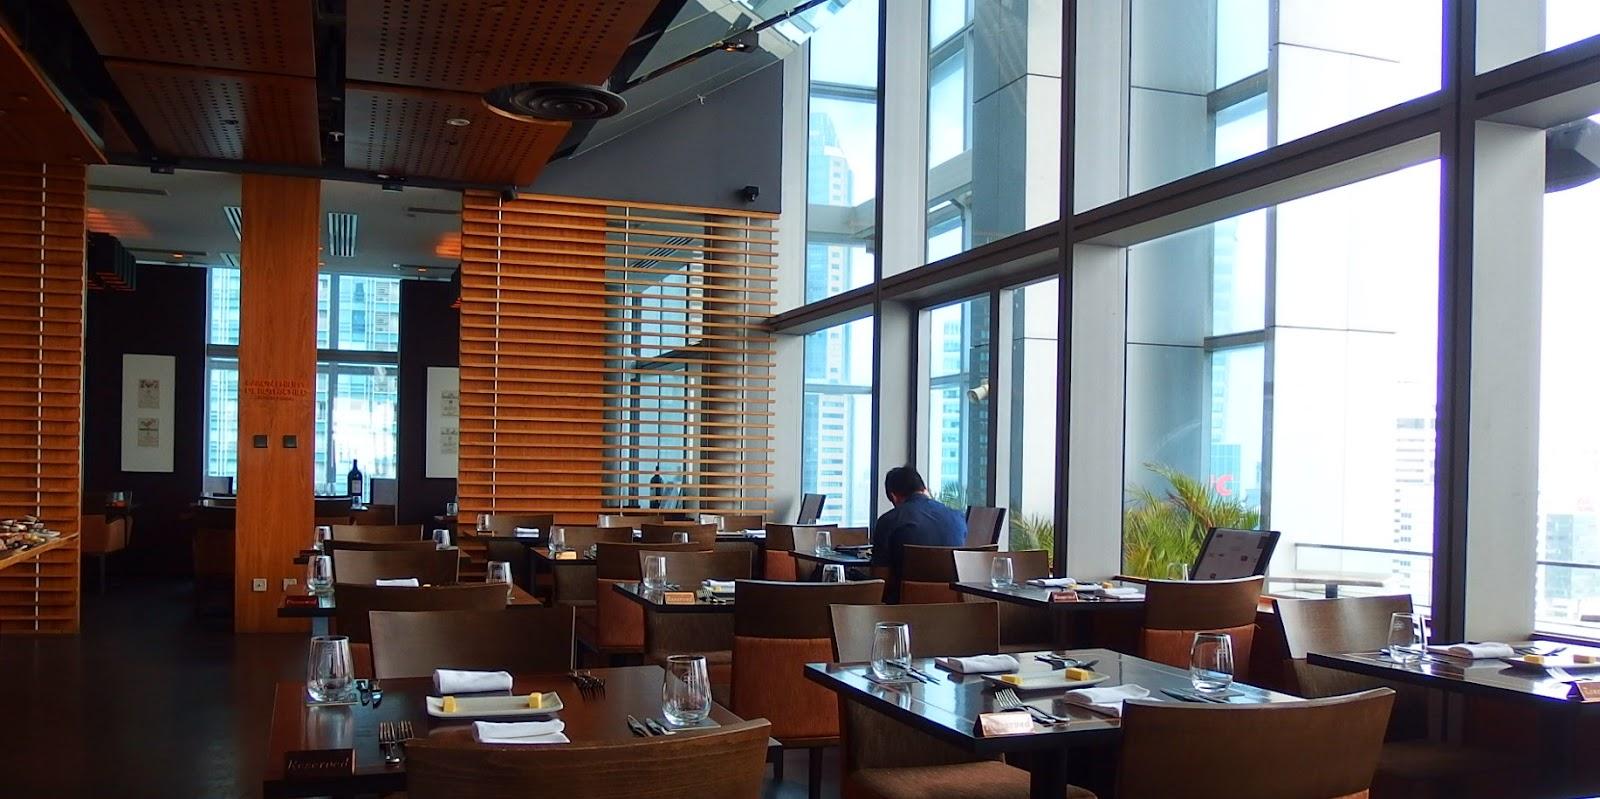 SuMMeR LoVes To Eat! Singapore Food Blog